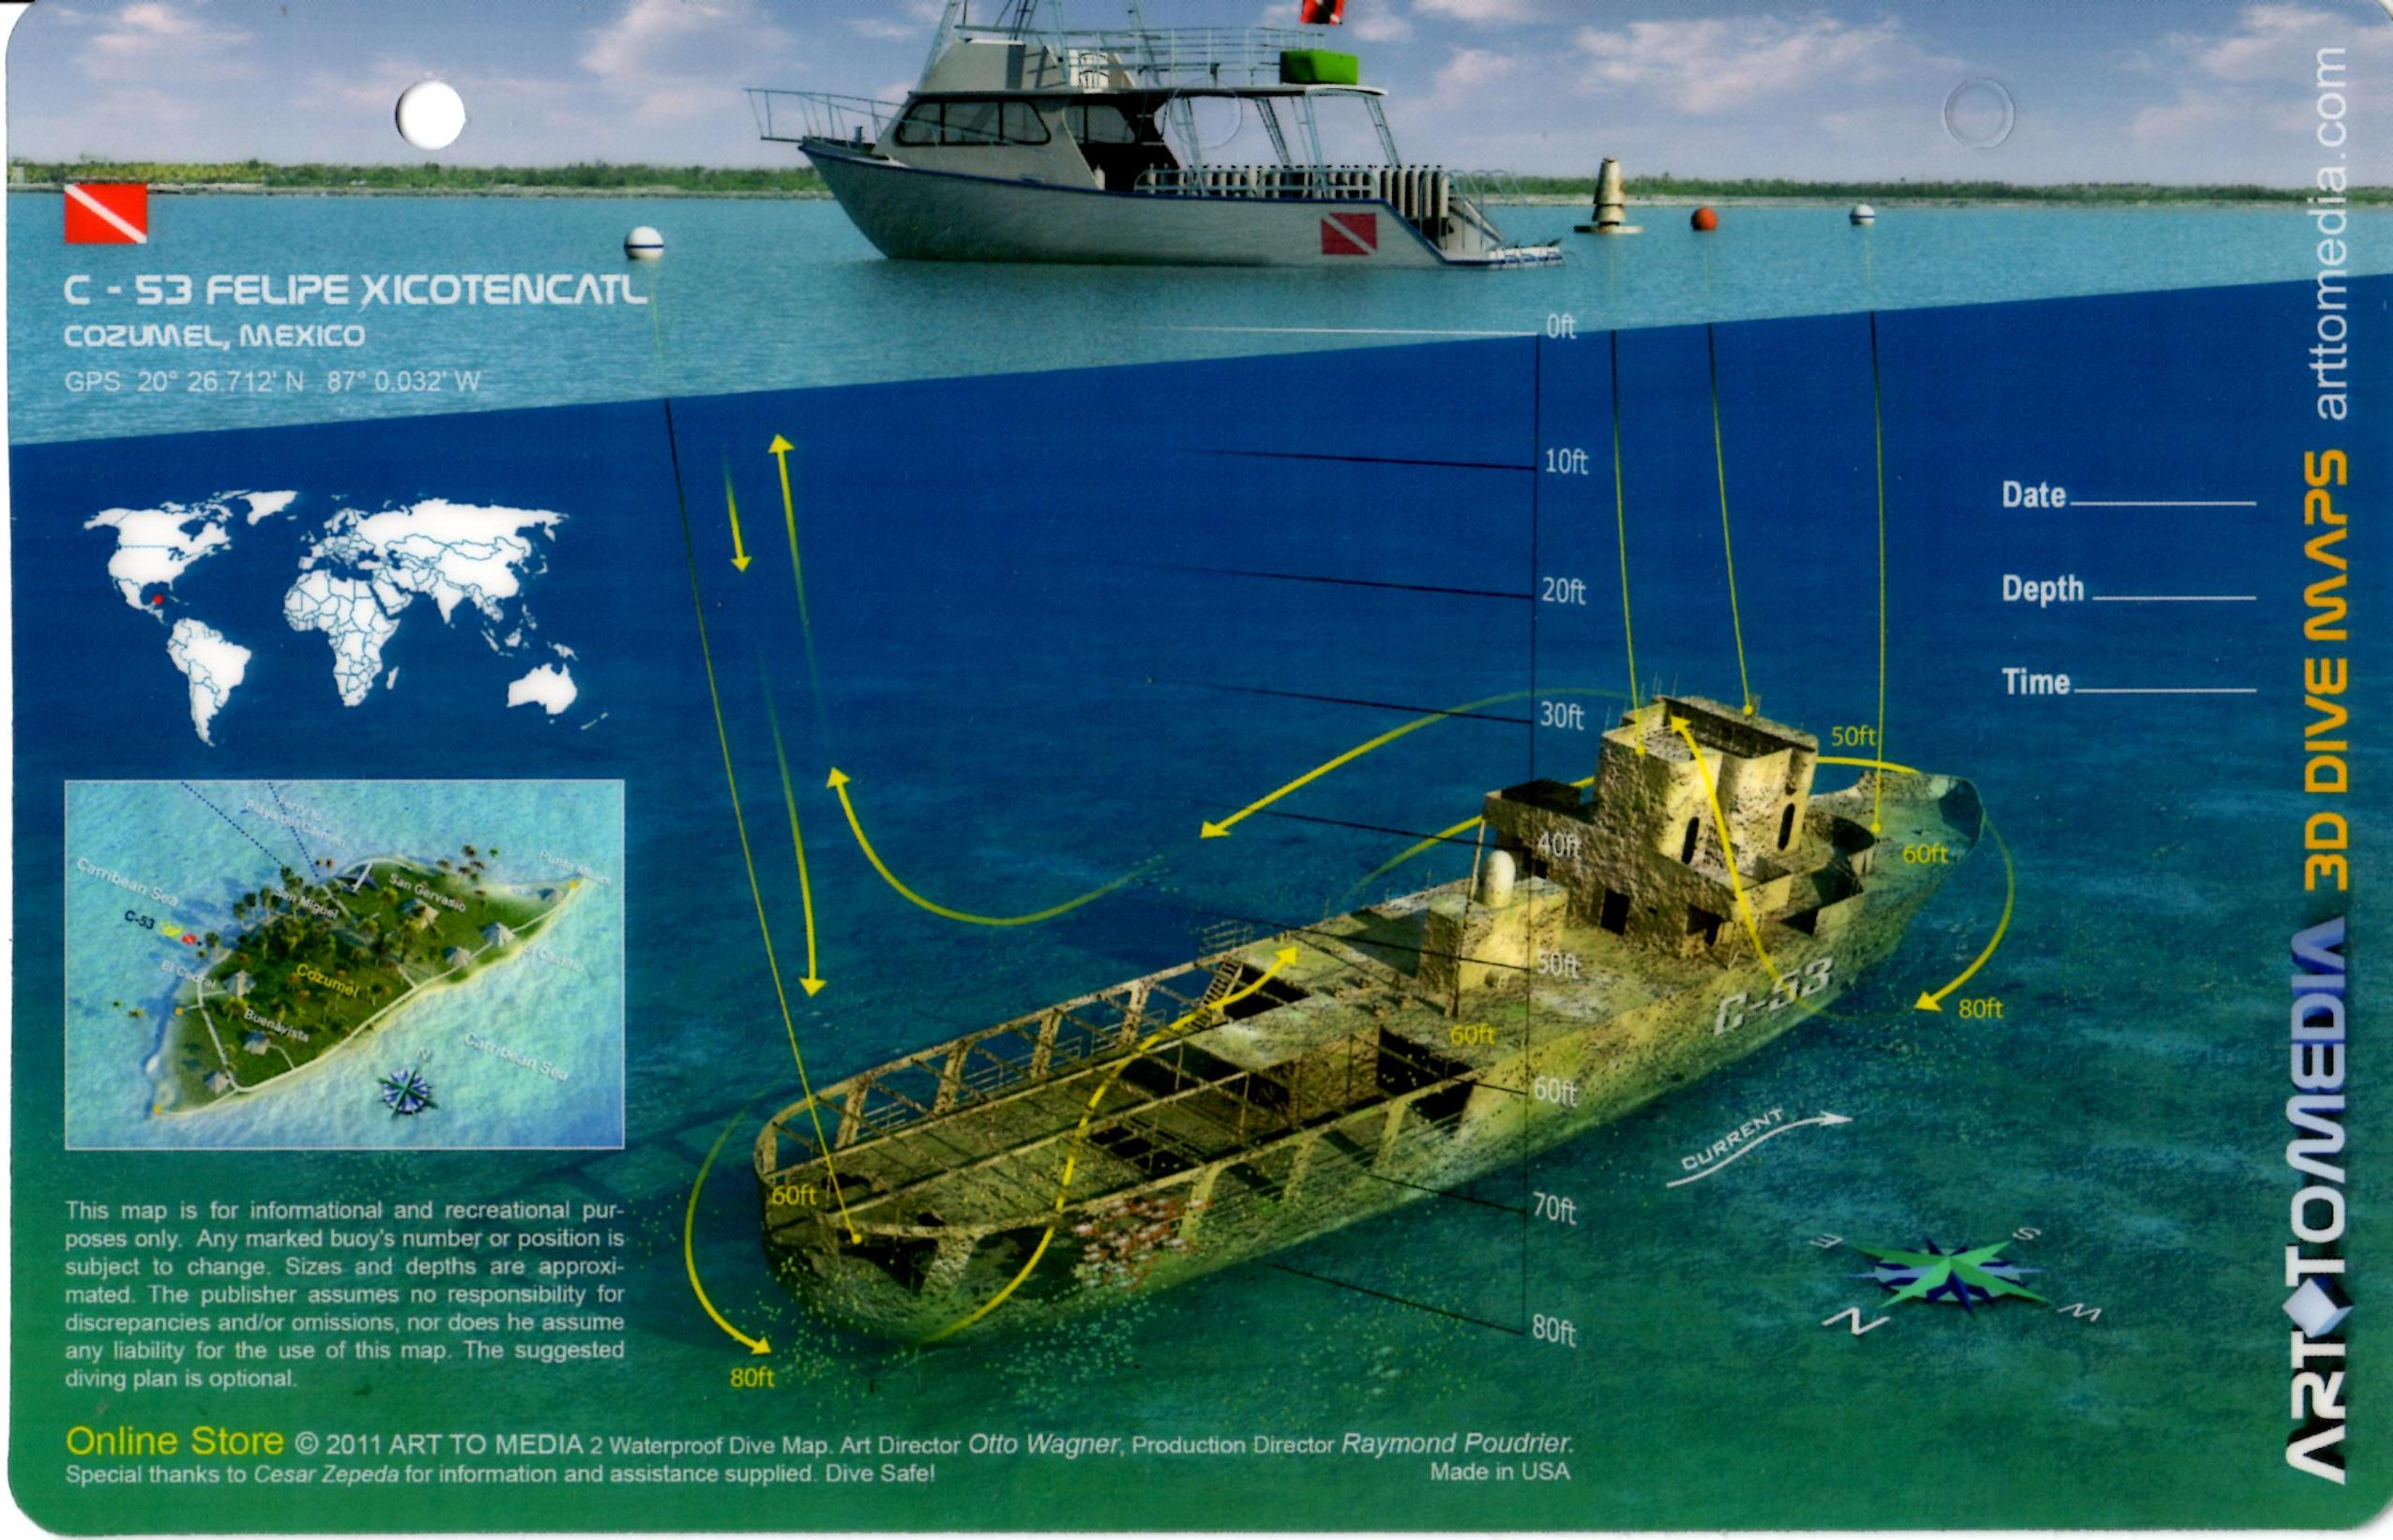 53 Felipe Xicotencatl Cozumel 3D Dive Site Card